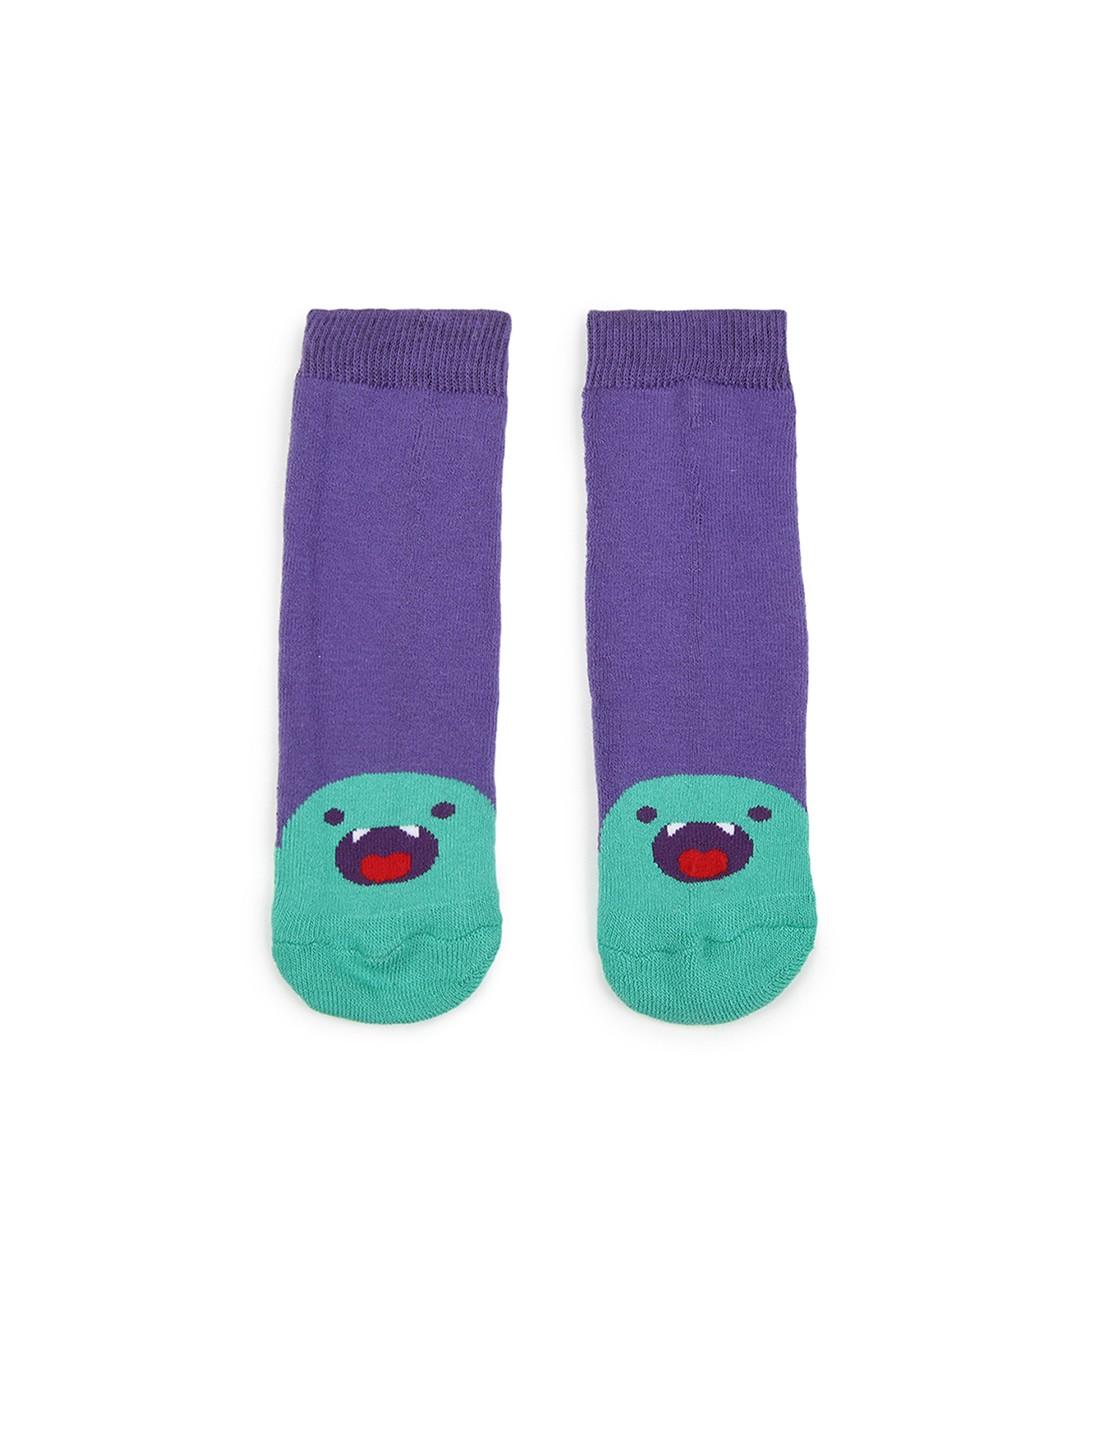 Soxytoes | Soxytoes Monster Cotton Crew Length Purple Kids Socks-Age (4-8 Years)